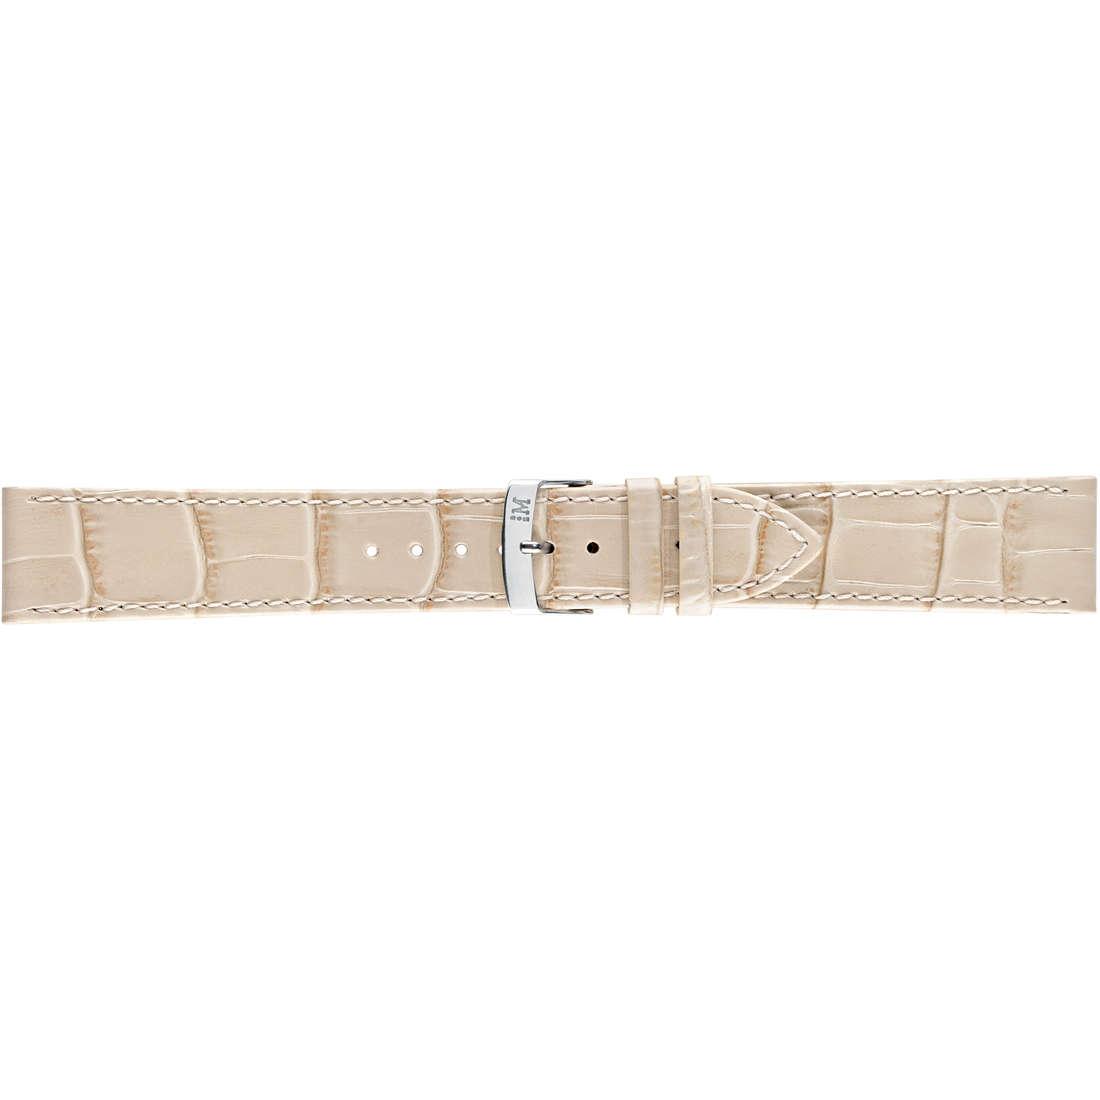 montre bande de montres homme Morellato Performance A01X2524656326CR14